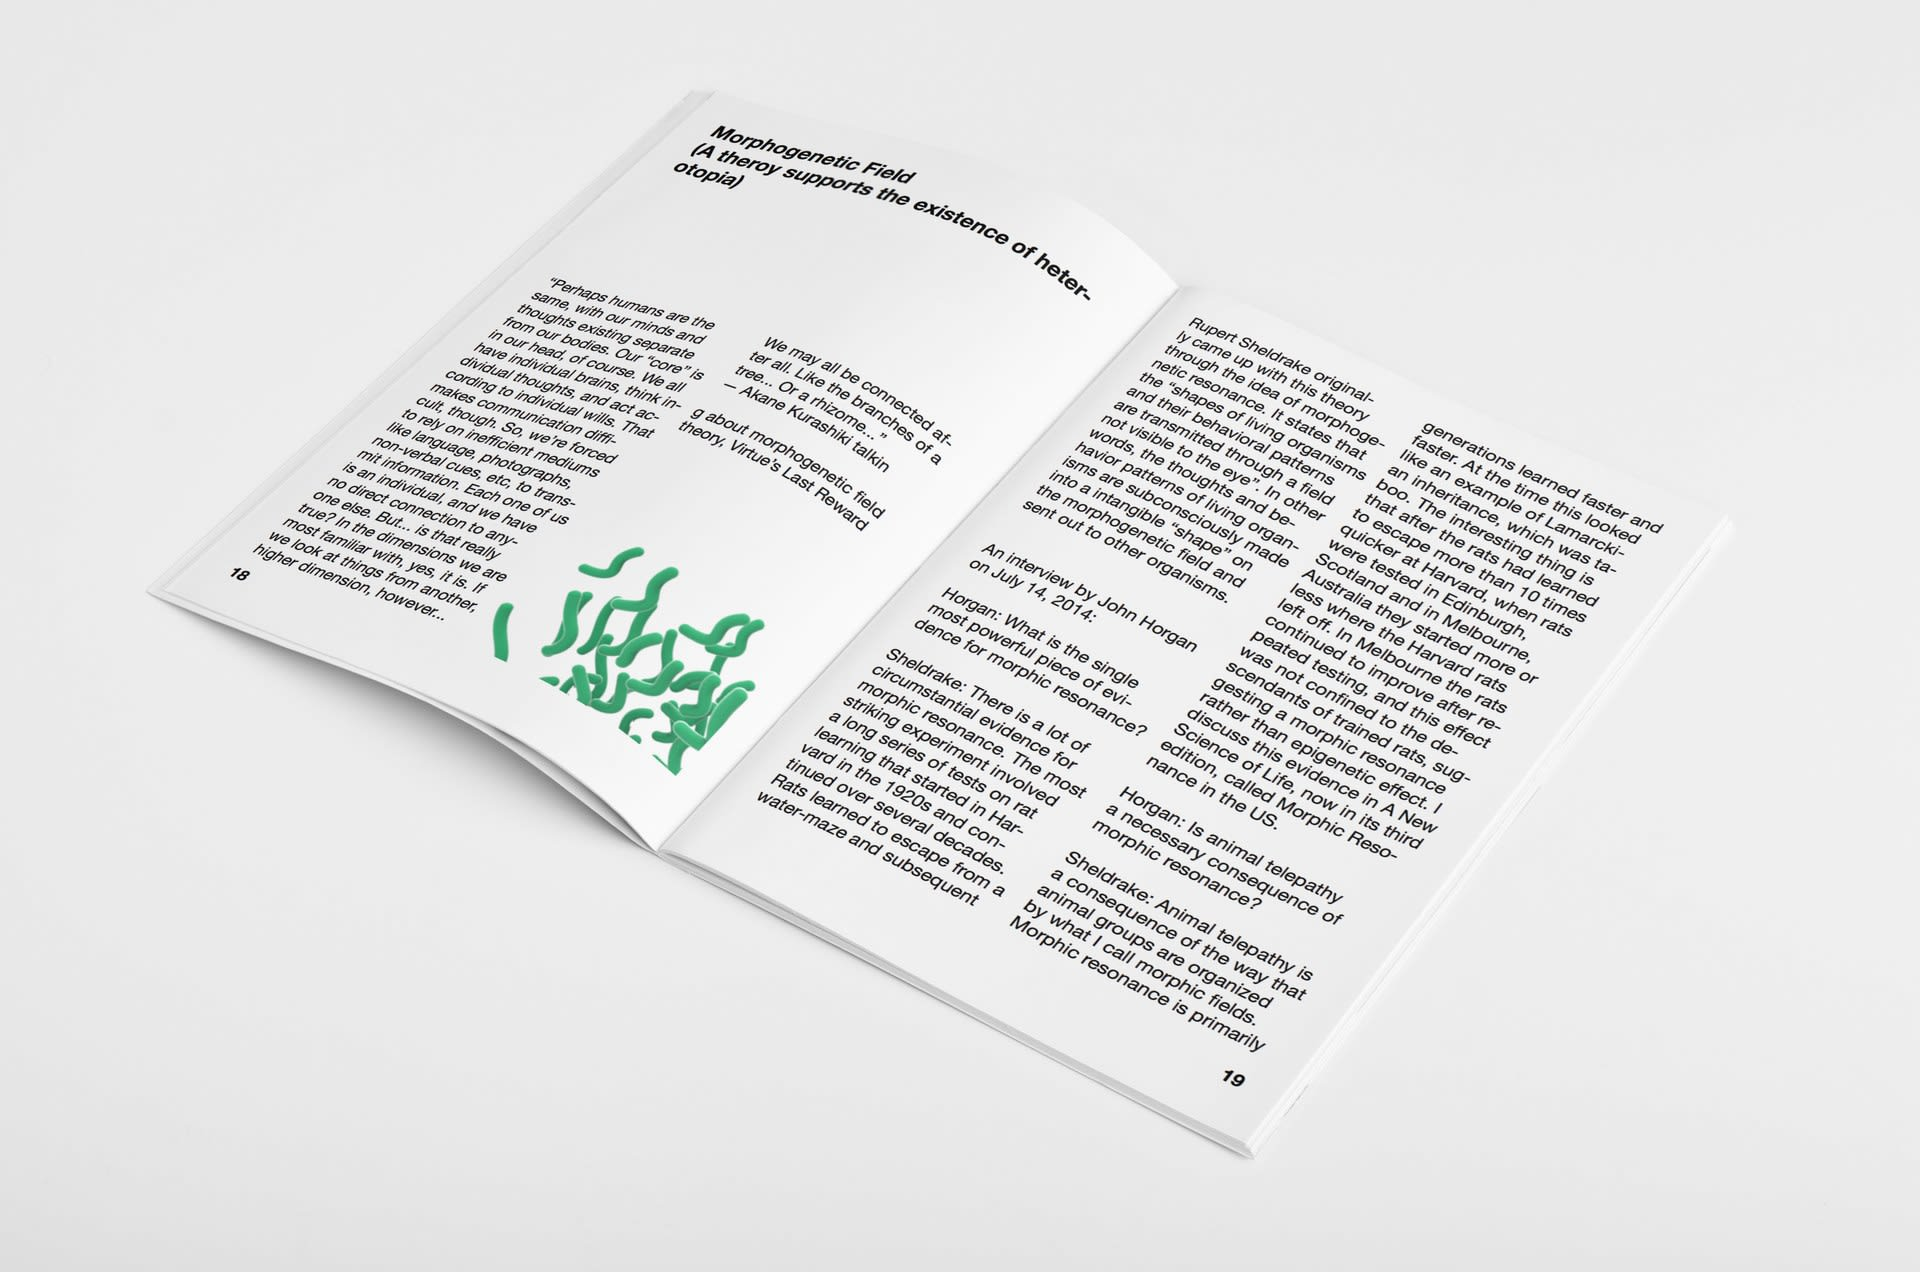 heterotopia research book6